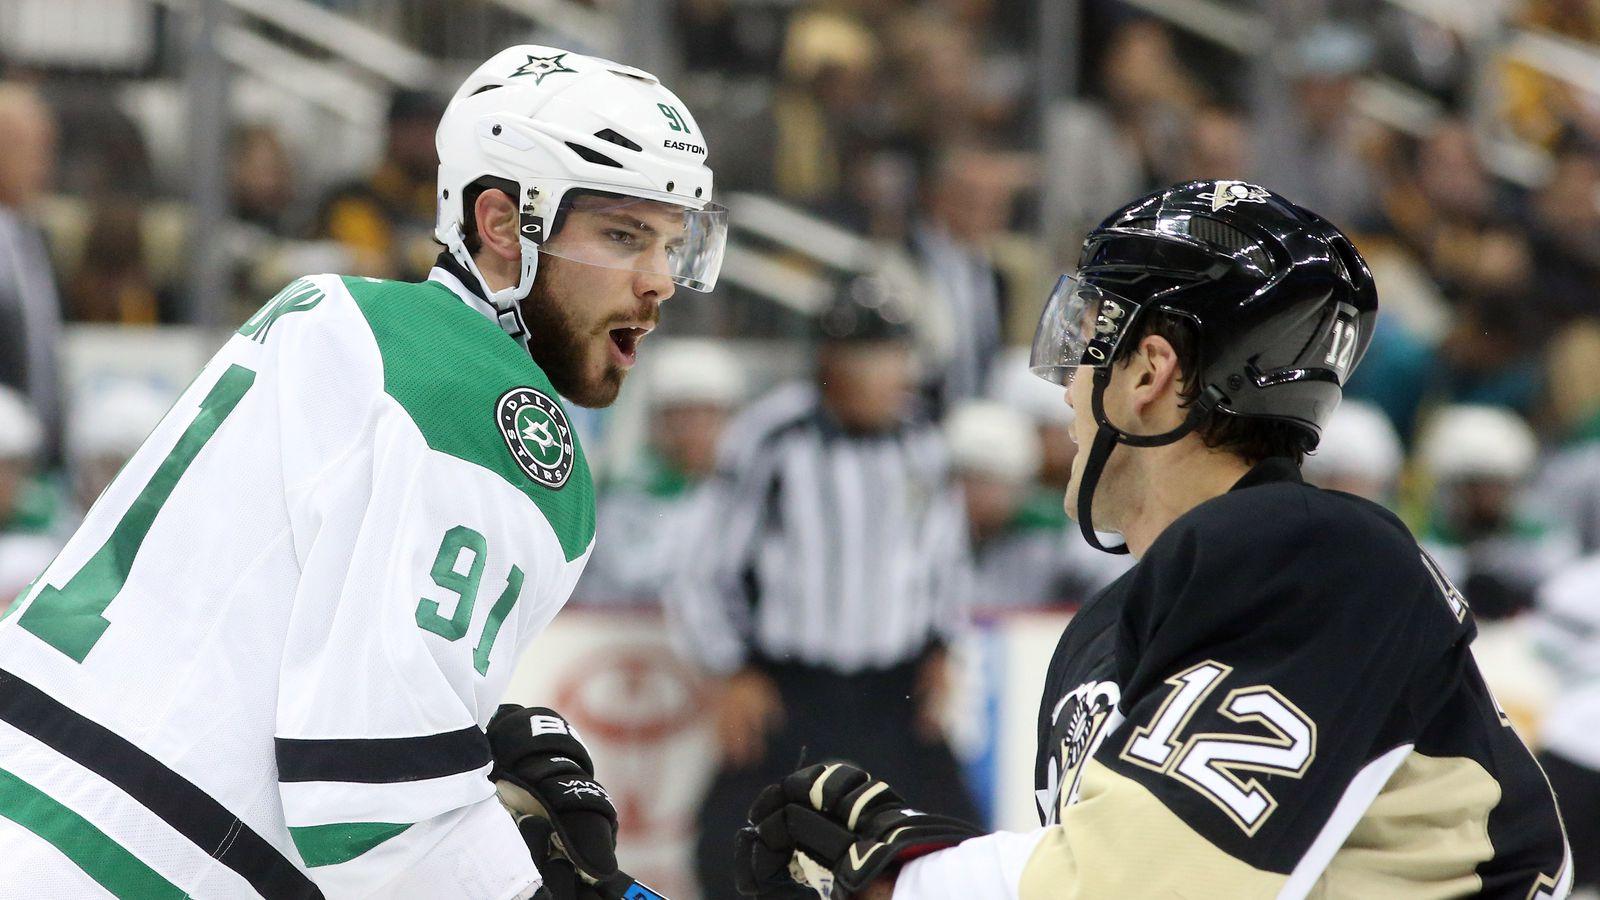 NHL博客委员会:讨论企鹅和星星的季后赛命运以及馅饼的优点